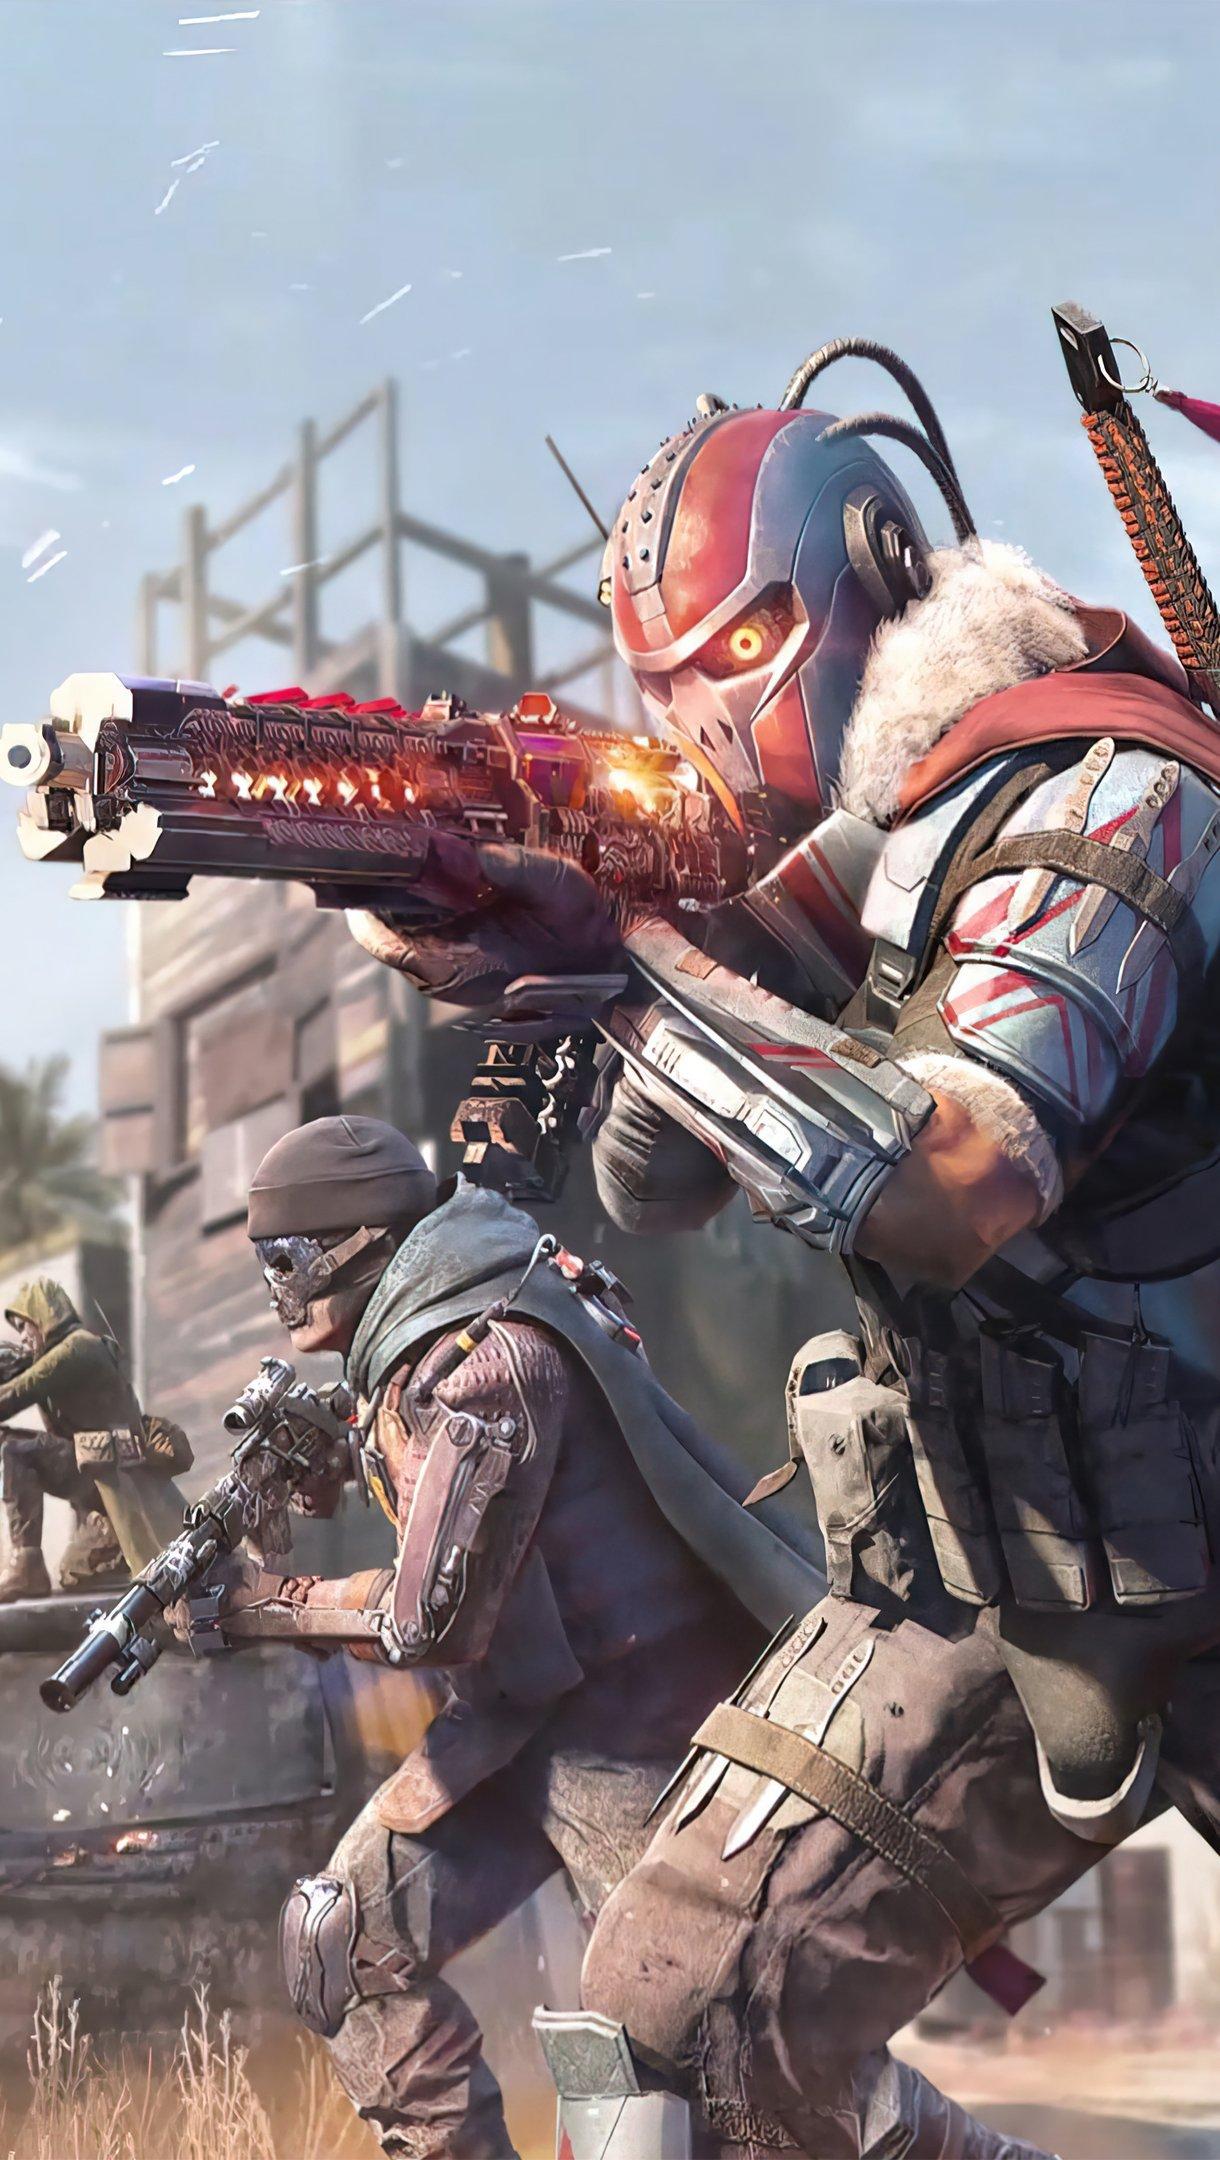 Wallpaper Call of Duty Mobile Season 2 Vertical